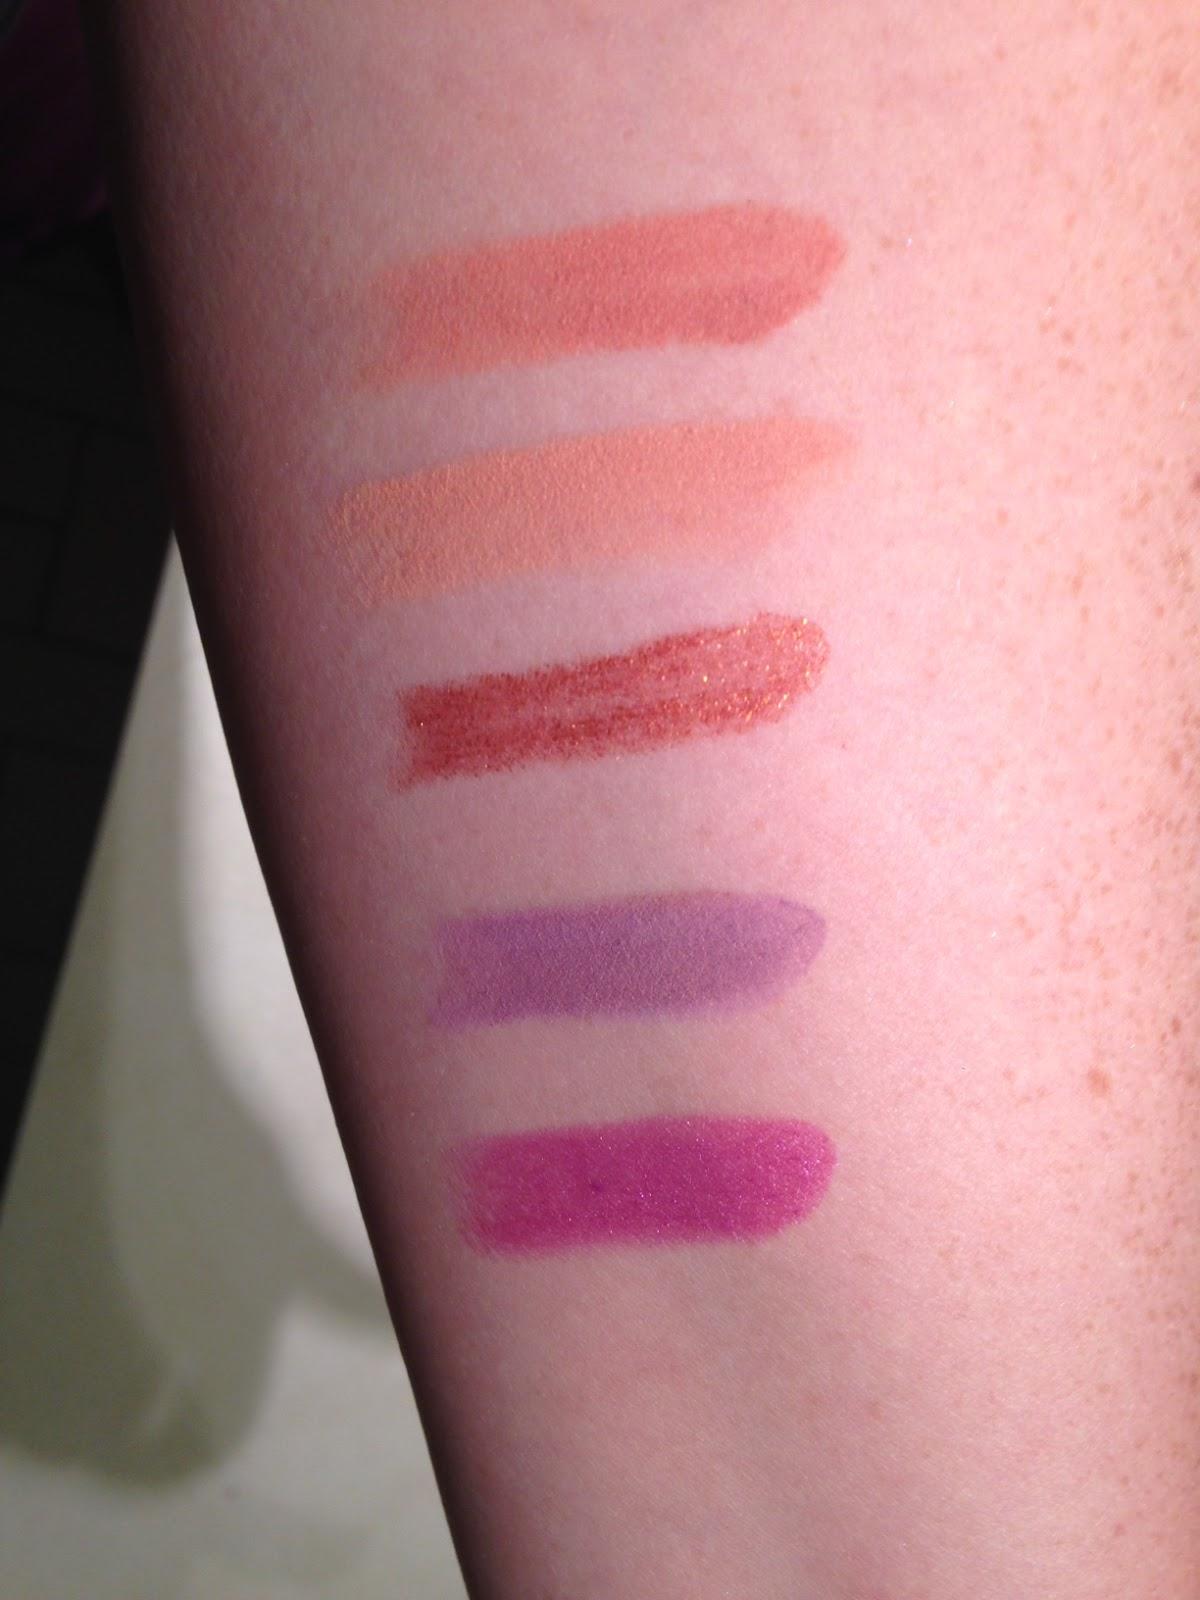 cb0683eb08 Review  Kat Von D Studded Kiss Lipstick  KatVonD ...